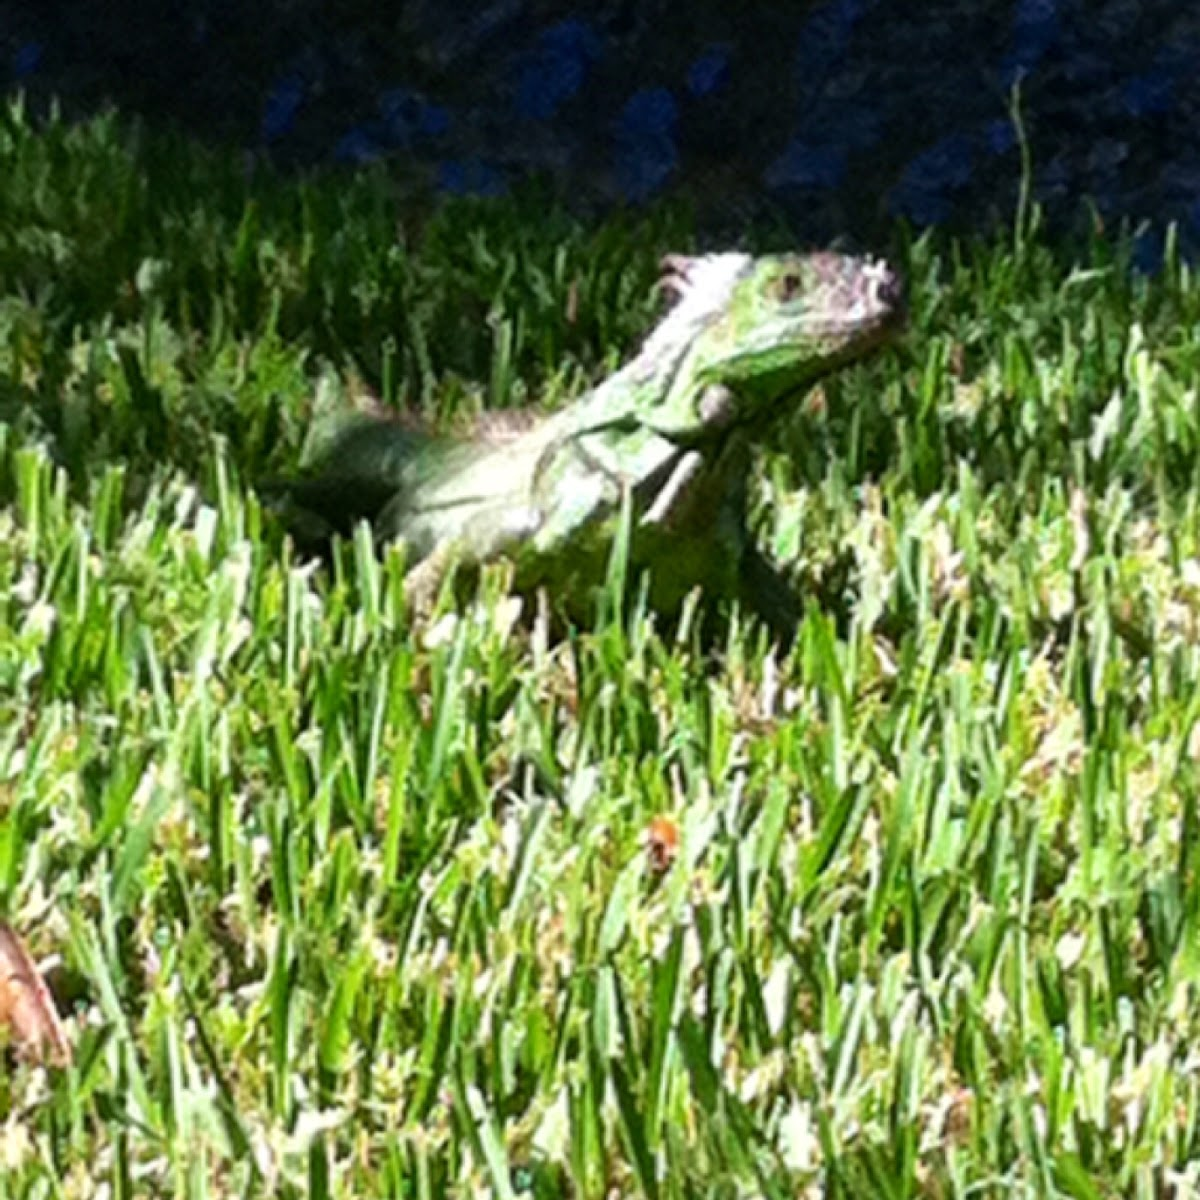 Great green iguana